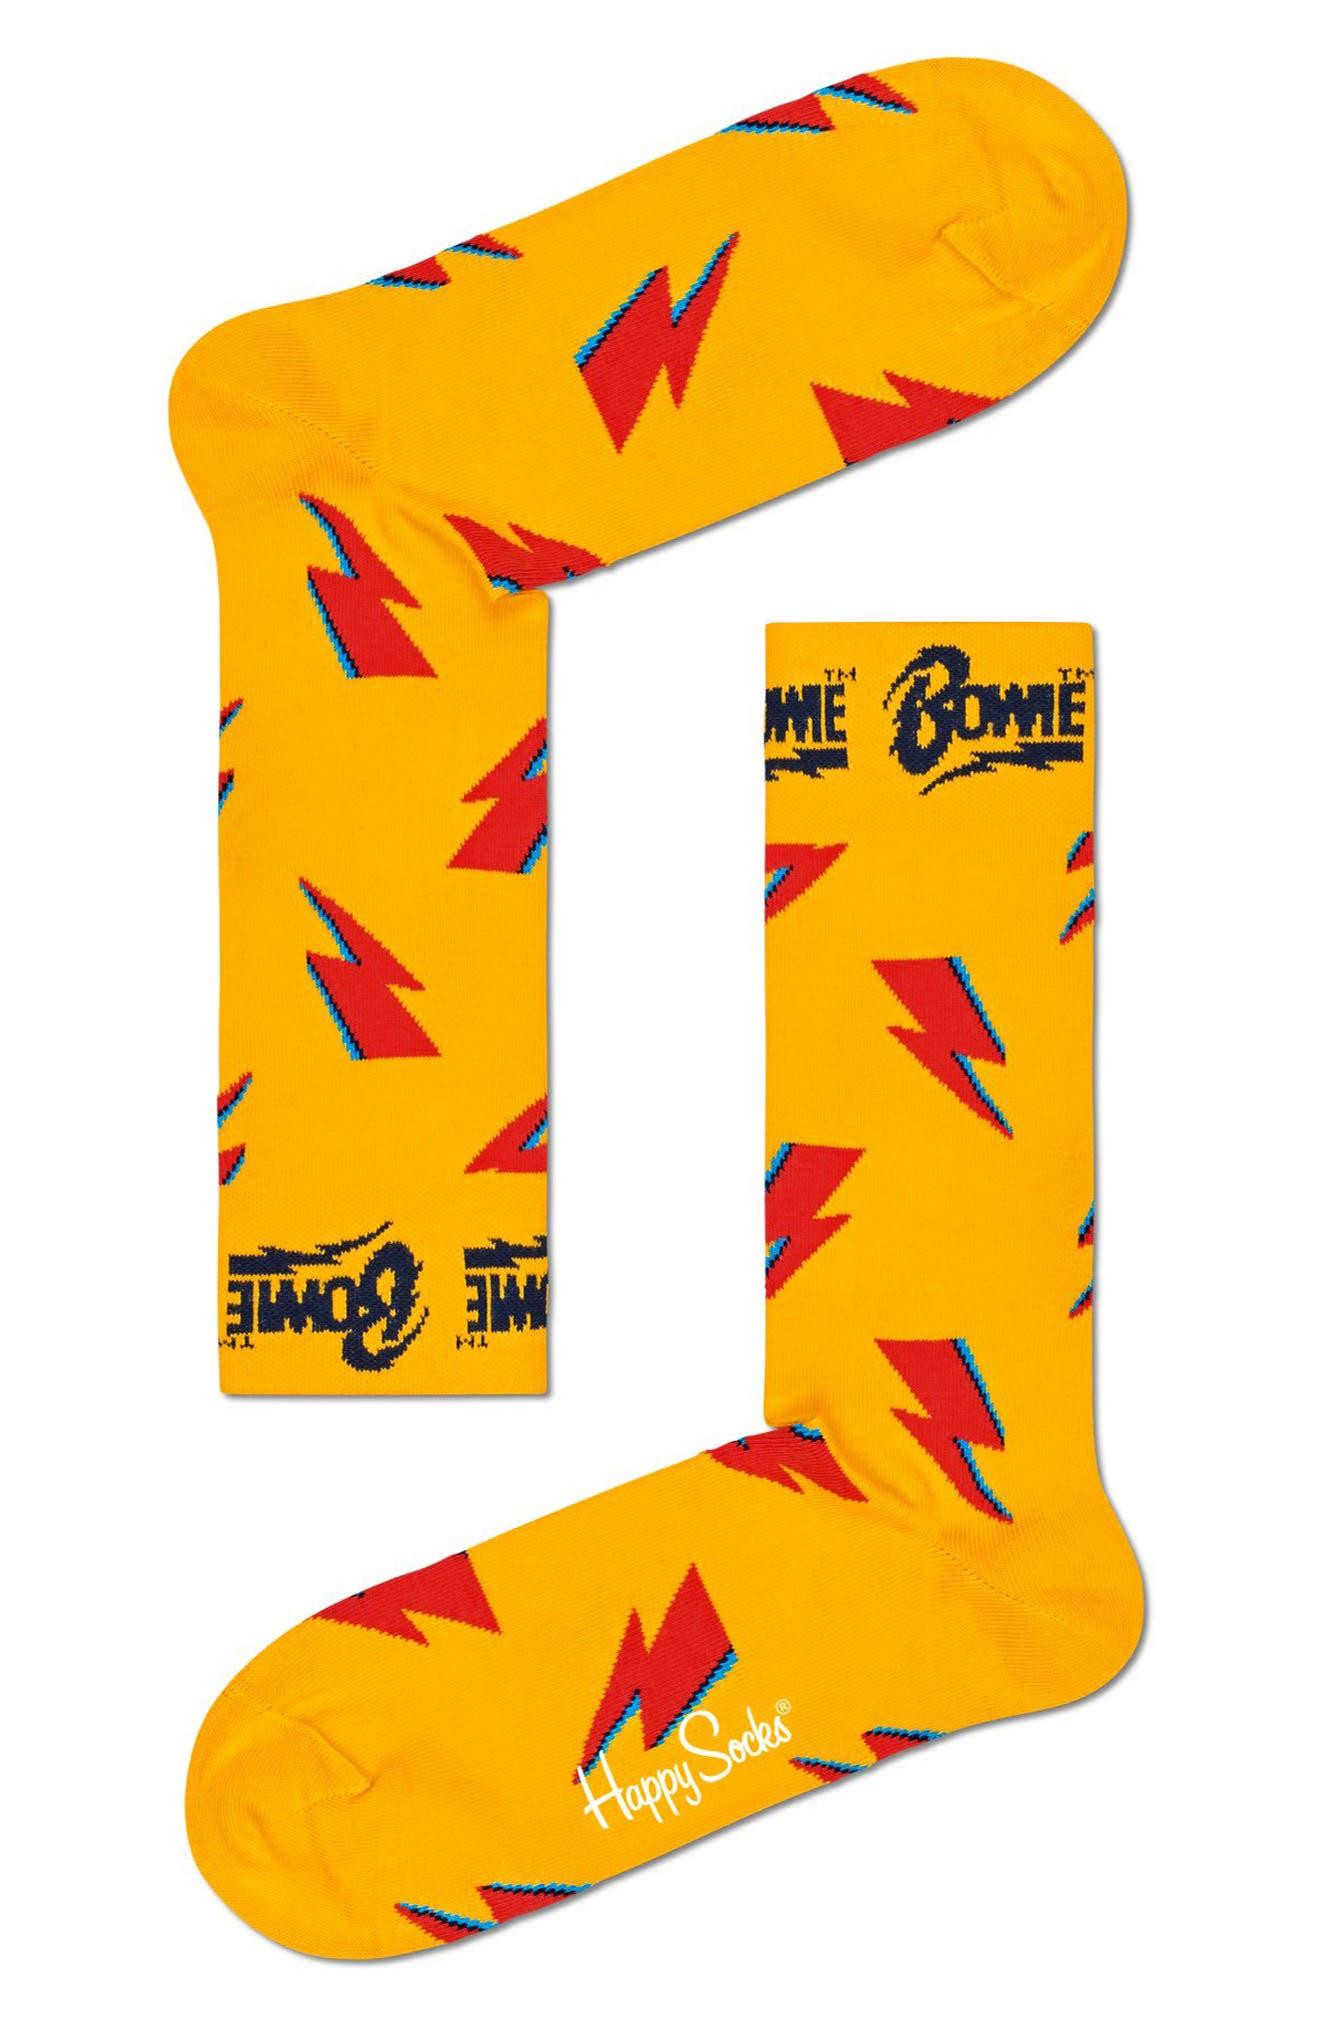 Flashy Bowie Socks